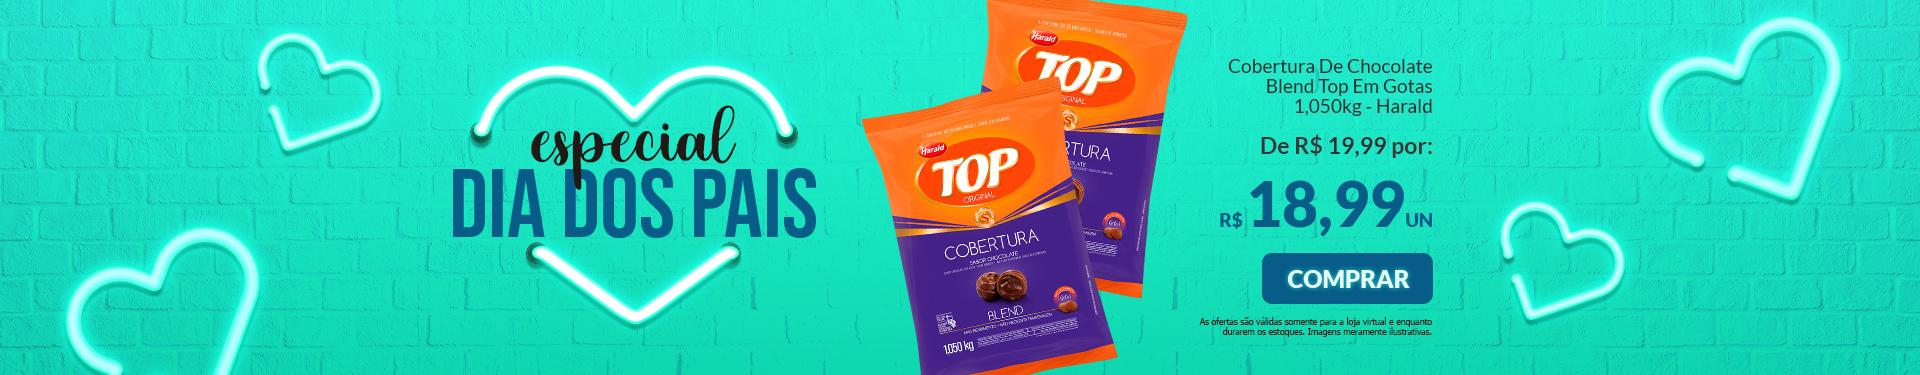 # COBERTURA DE CHOCOLATE BLEND TOP - GOTAS 1,050KG HARALD